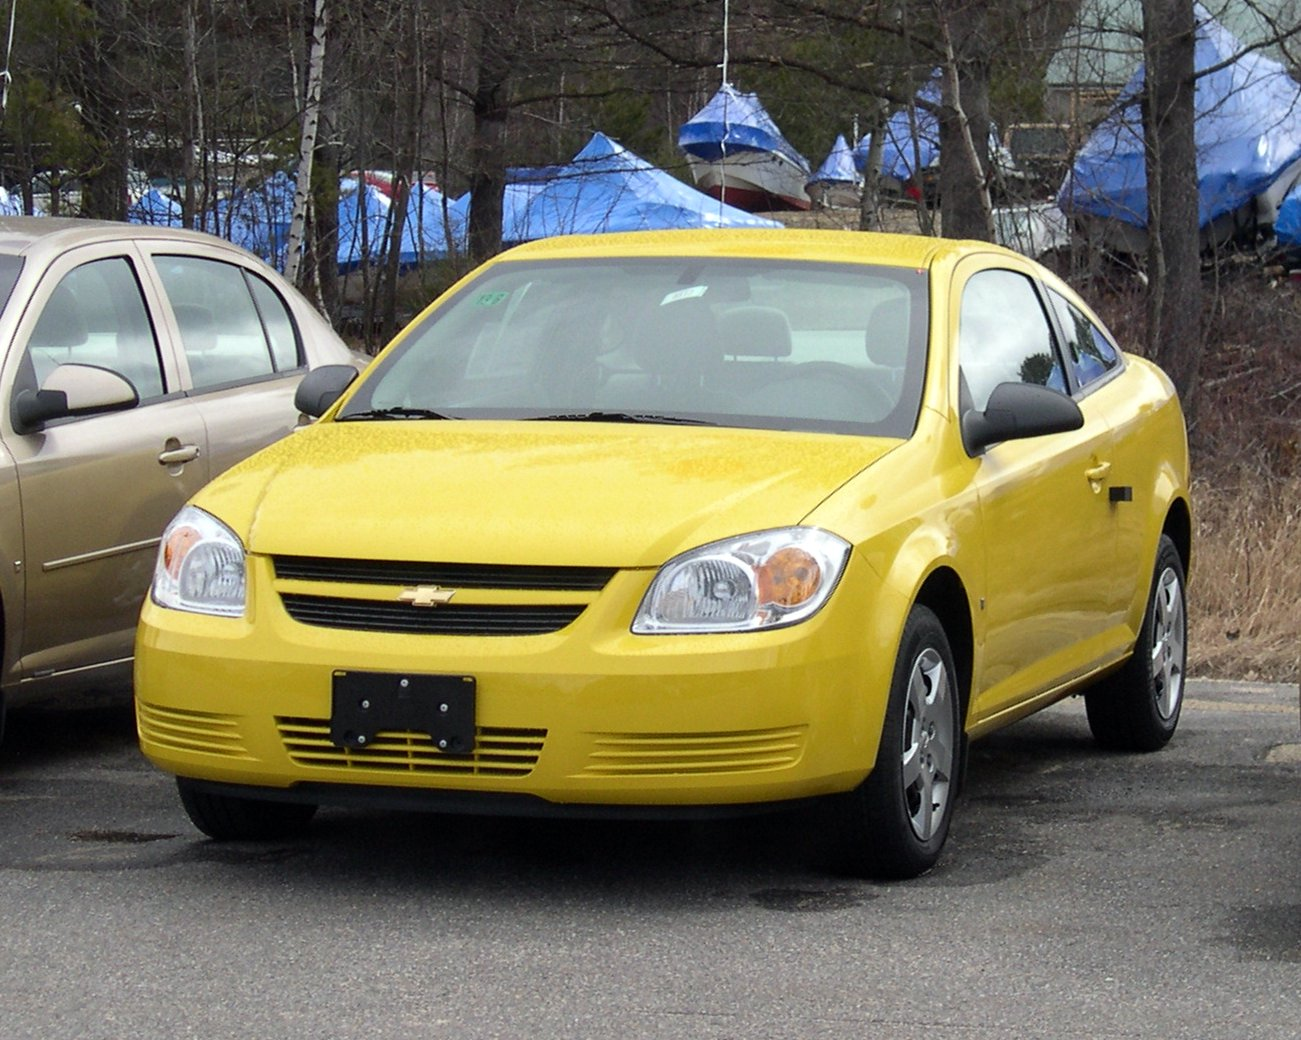 Chevrolet Cobalt 2006 foto - 5